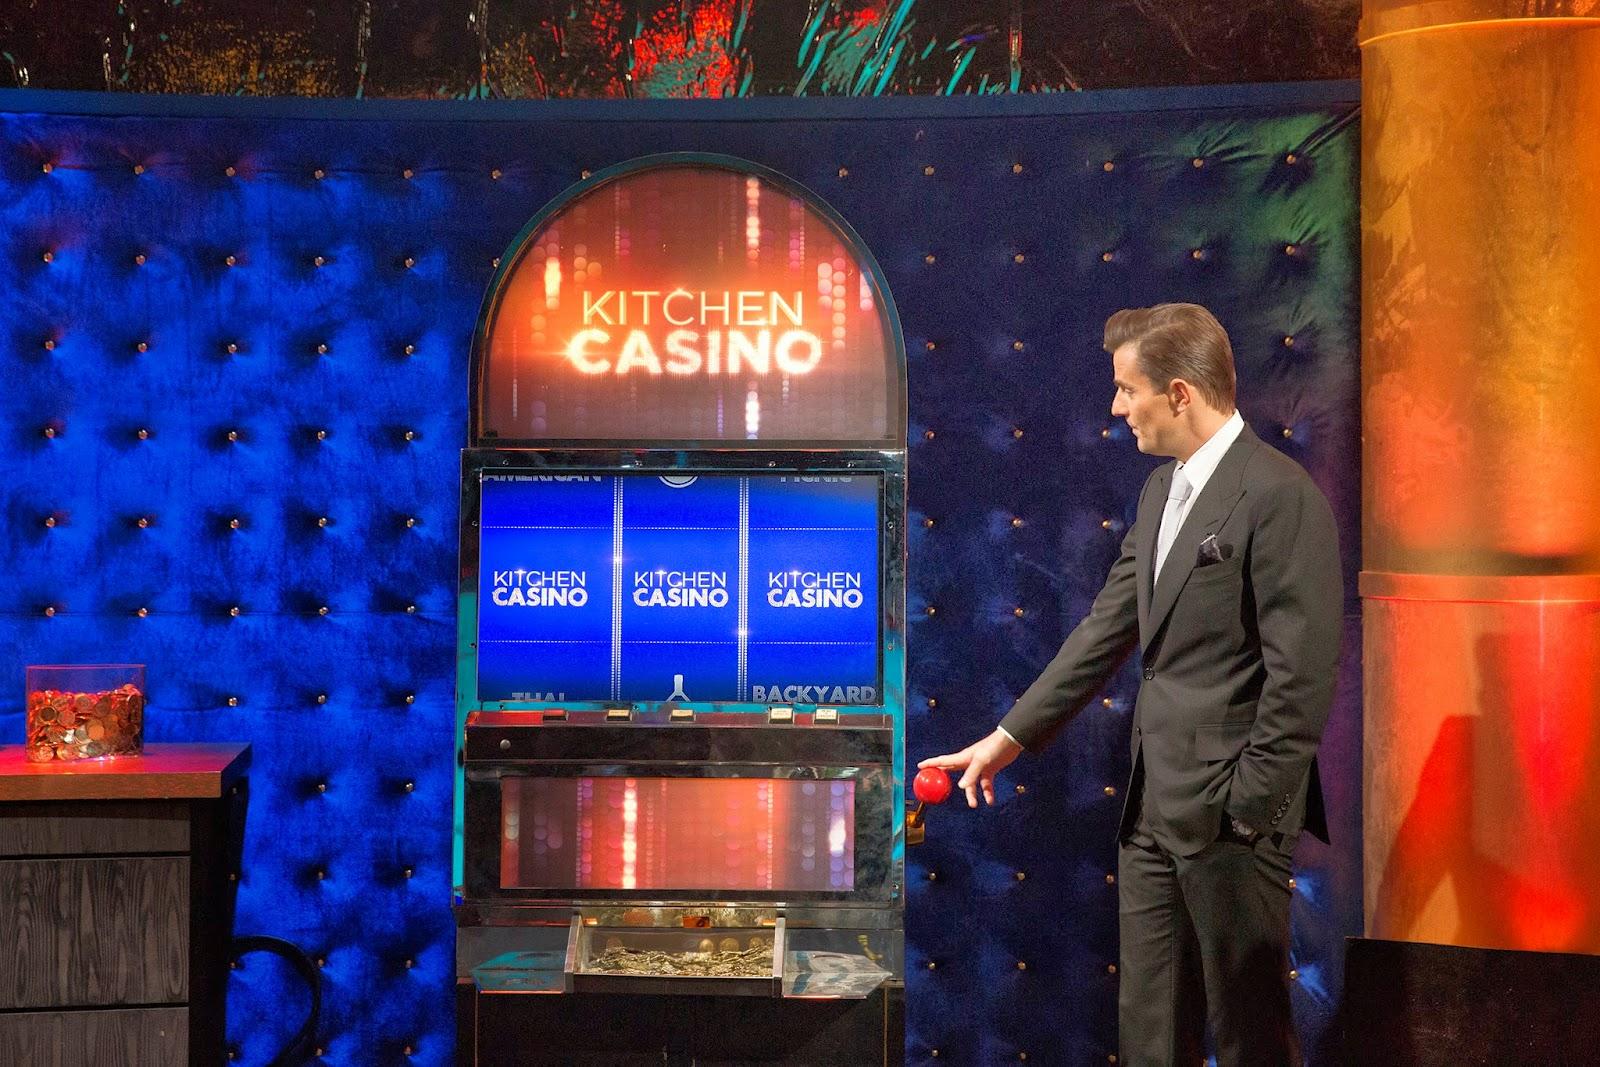 Kitchen casino contestant ariel